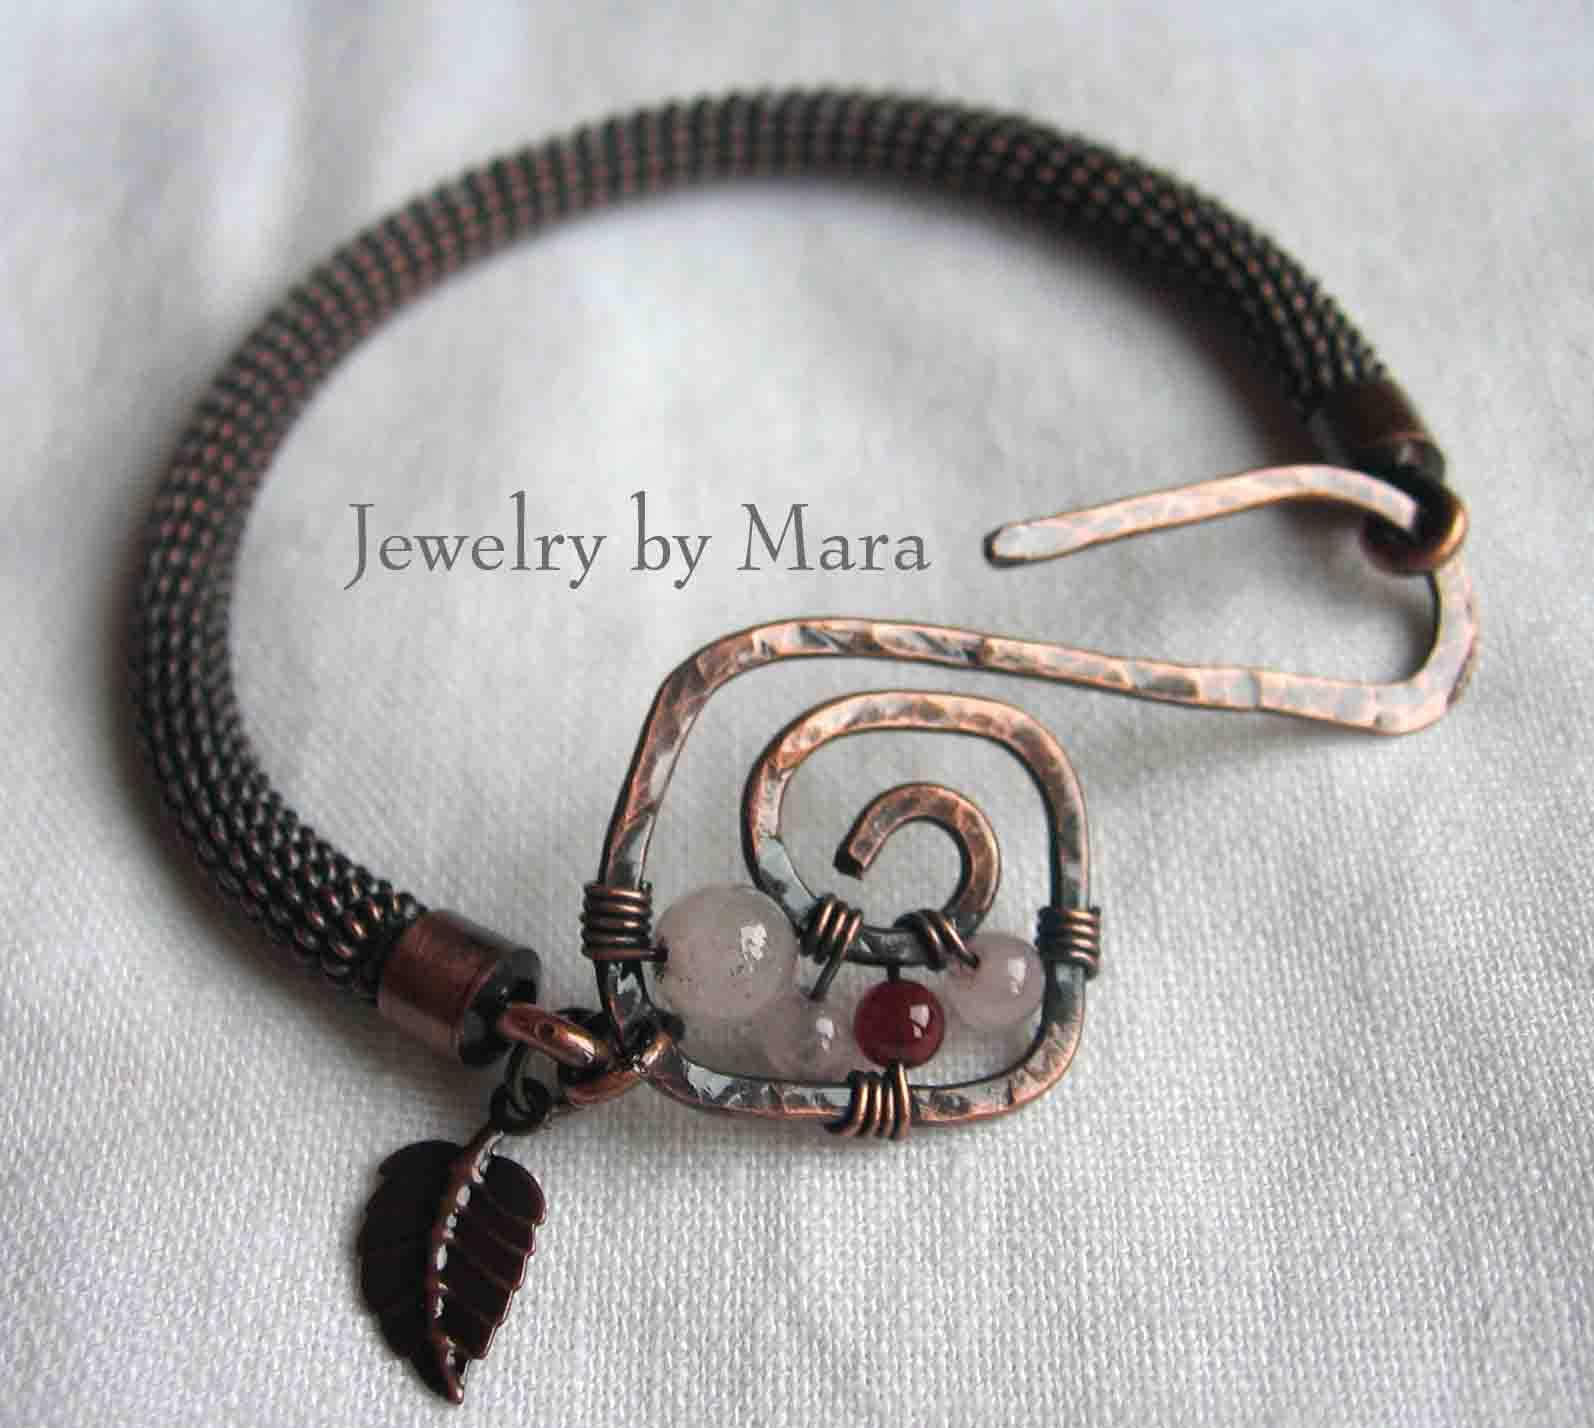 nakit -ukras ili umetnost - Page 4 Radionica+nakita+skola+220+copy